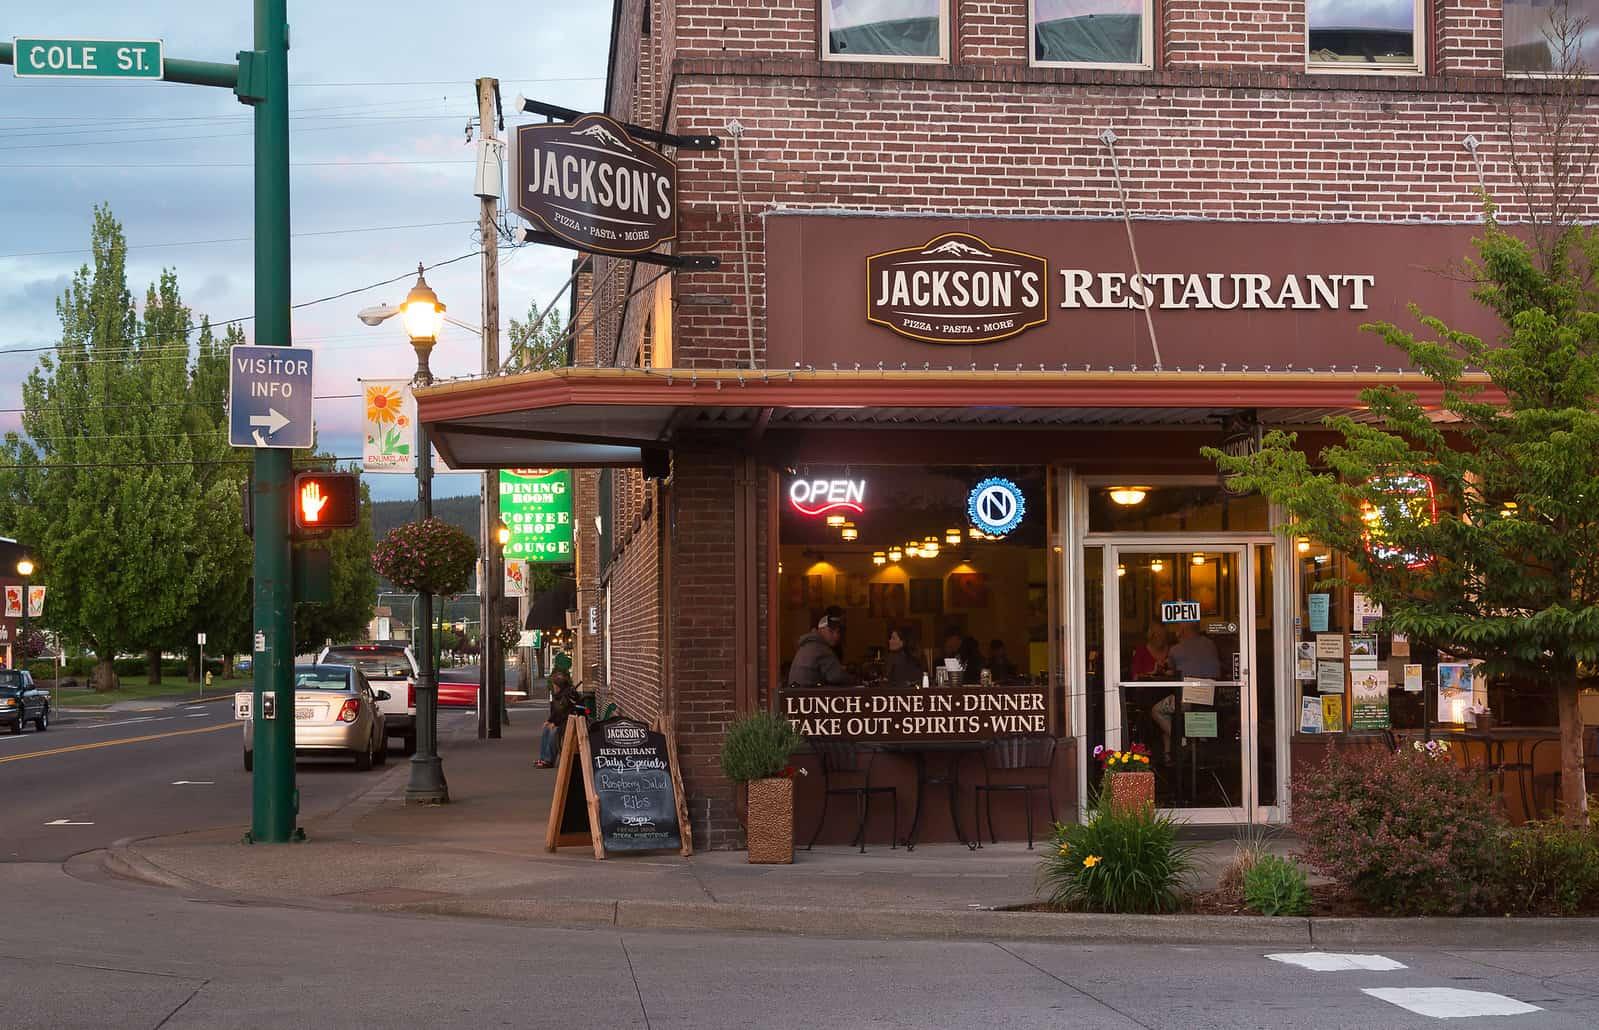 Jackson's Restaurant in downtown Enumclaw. Photo courtesy Dan DeVries Photography.